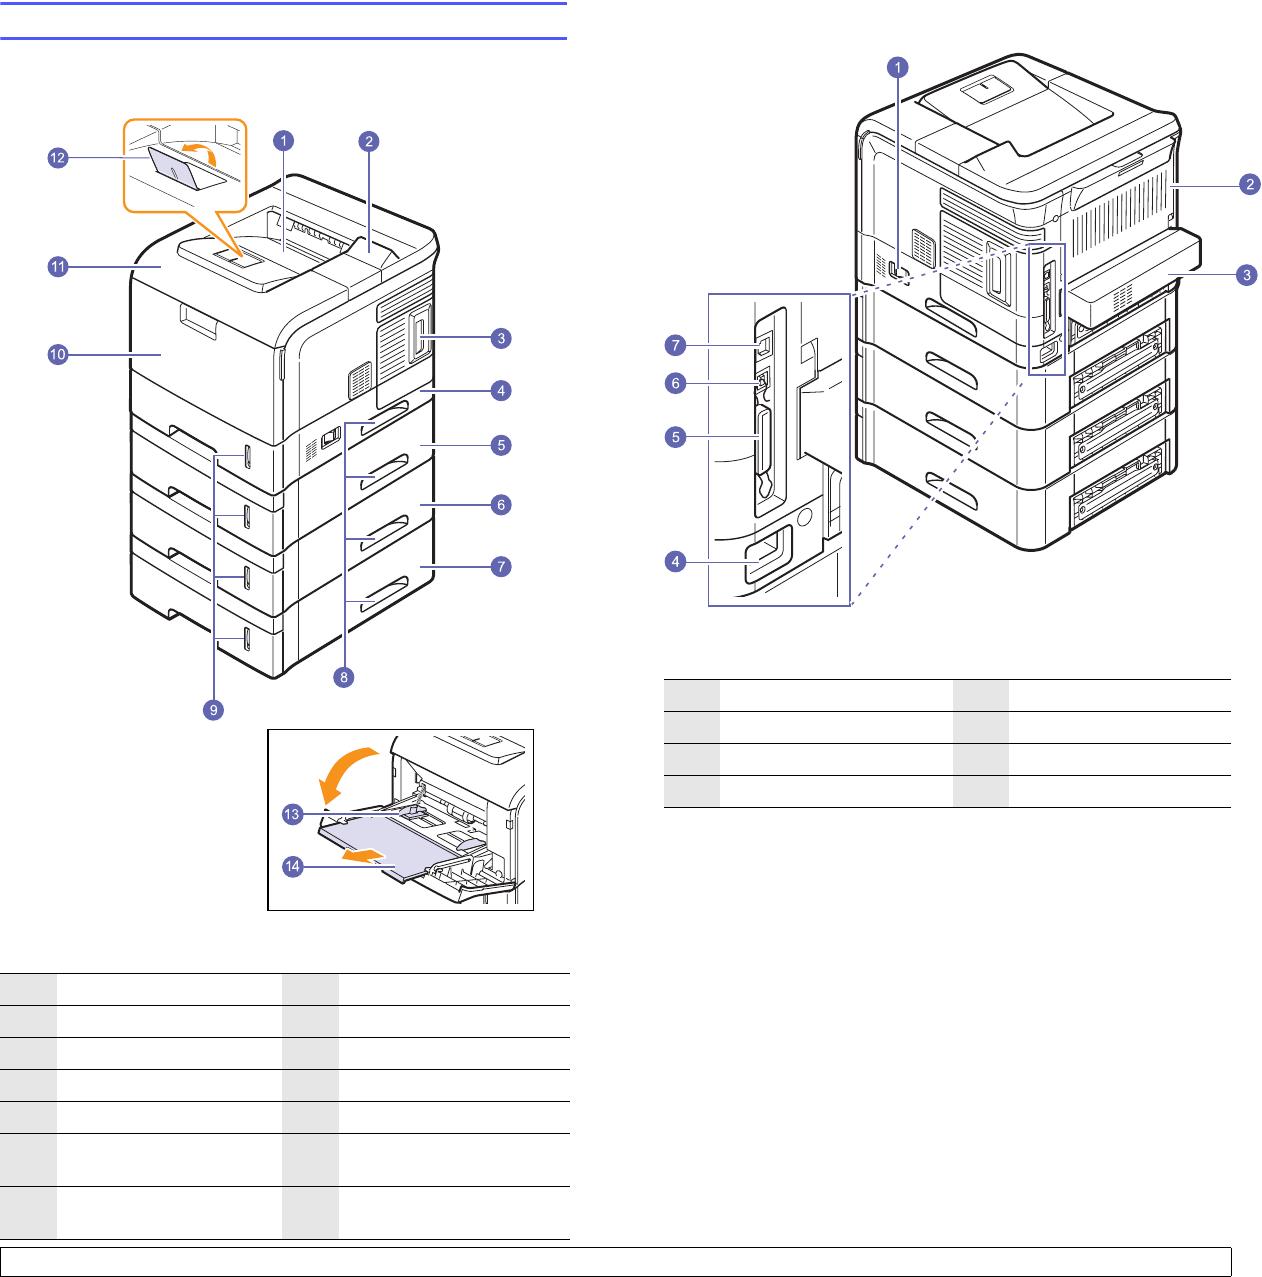 Ricoh Aficio Sp 5100n Users Manual Strap St 3 W 13